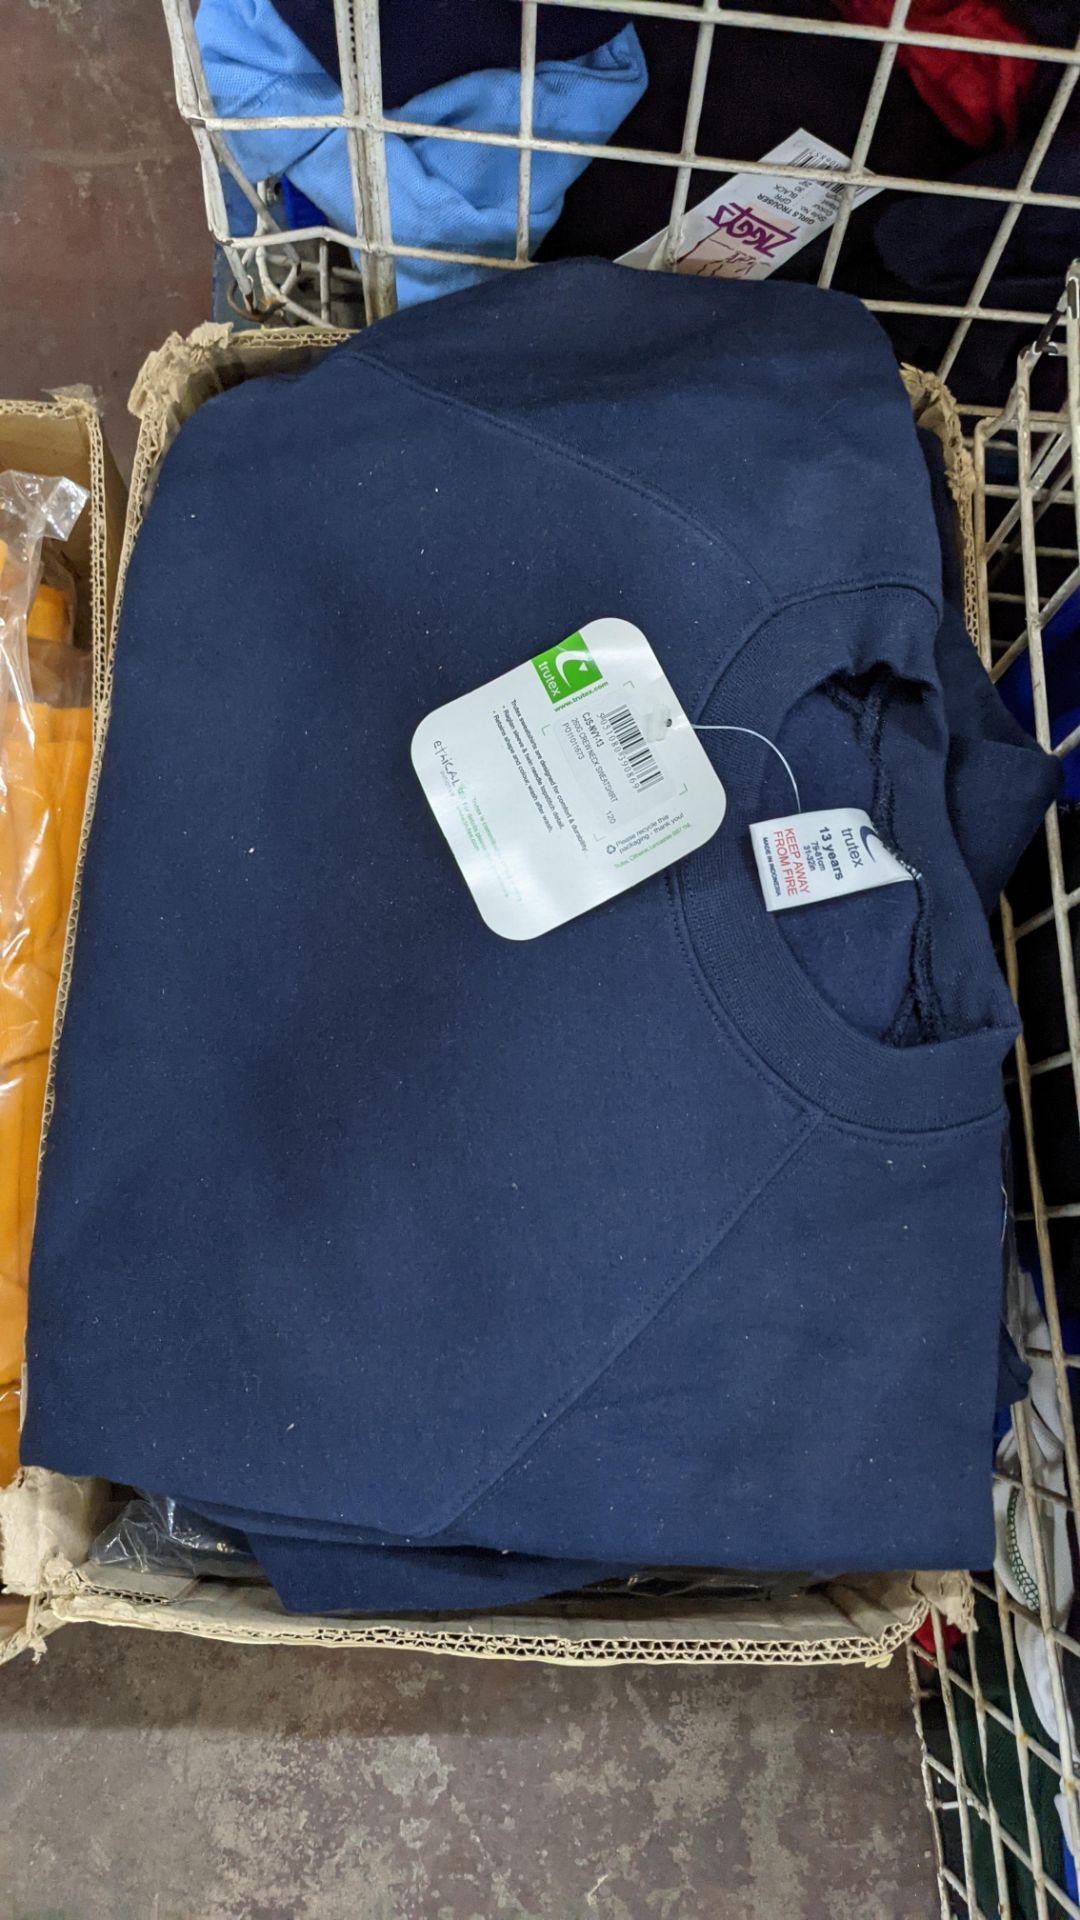 Approx 16 off assorted navy Trutex children's sweatshirts - Image 2 of 4